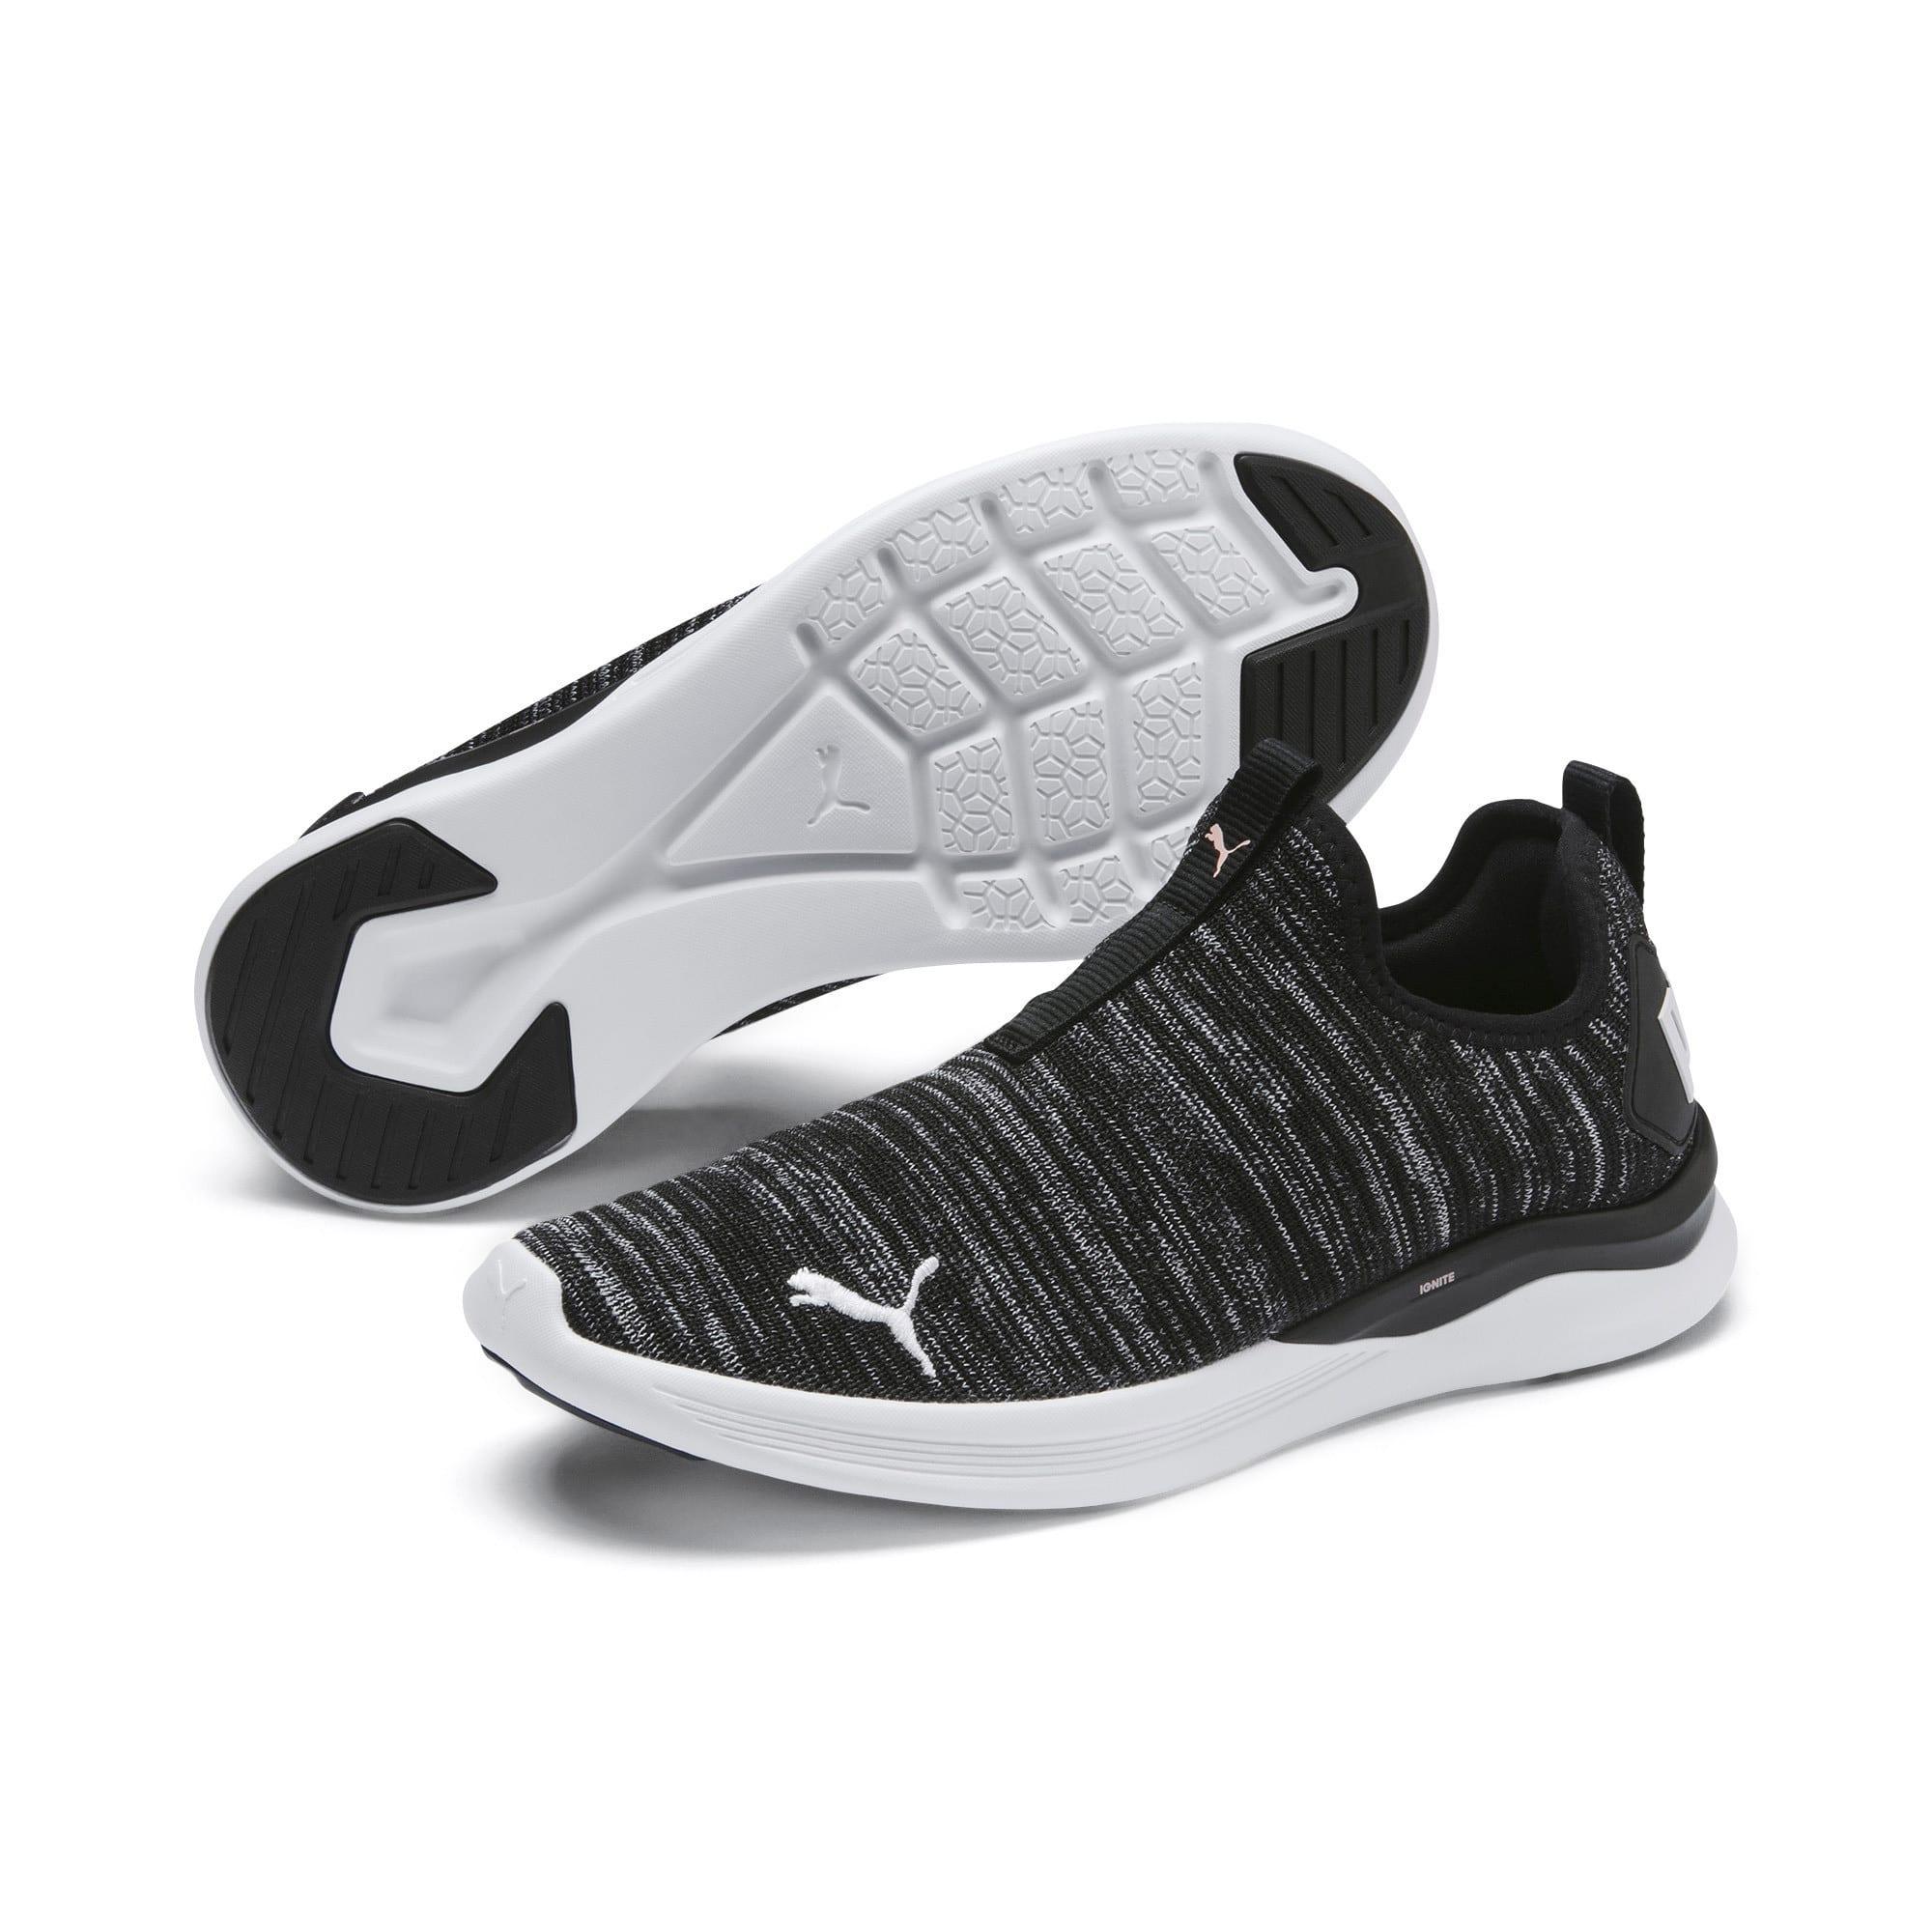 Thumbnail 2 of IGNITE Flash Summer Slip Women's Training Shoes, Puma Black-Puma White, medium